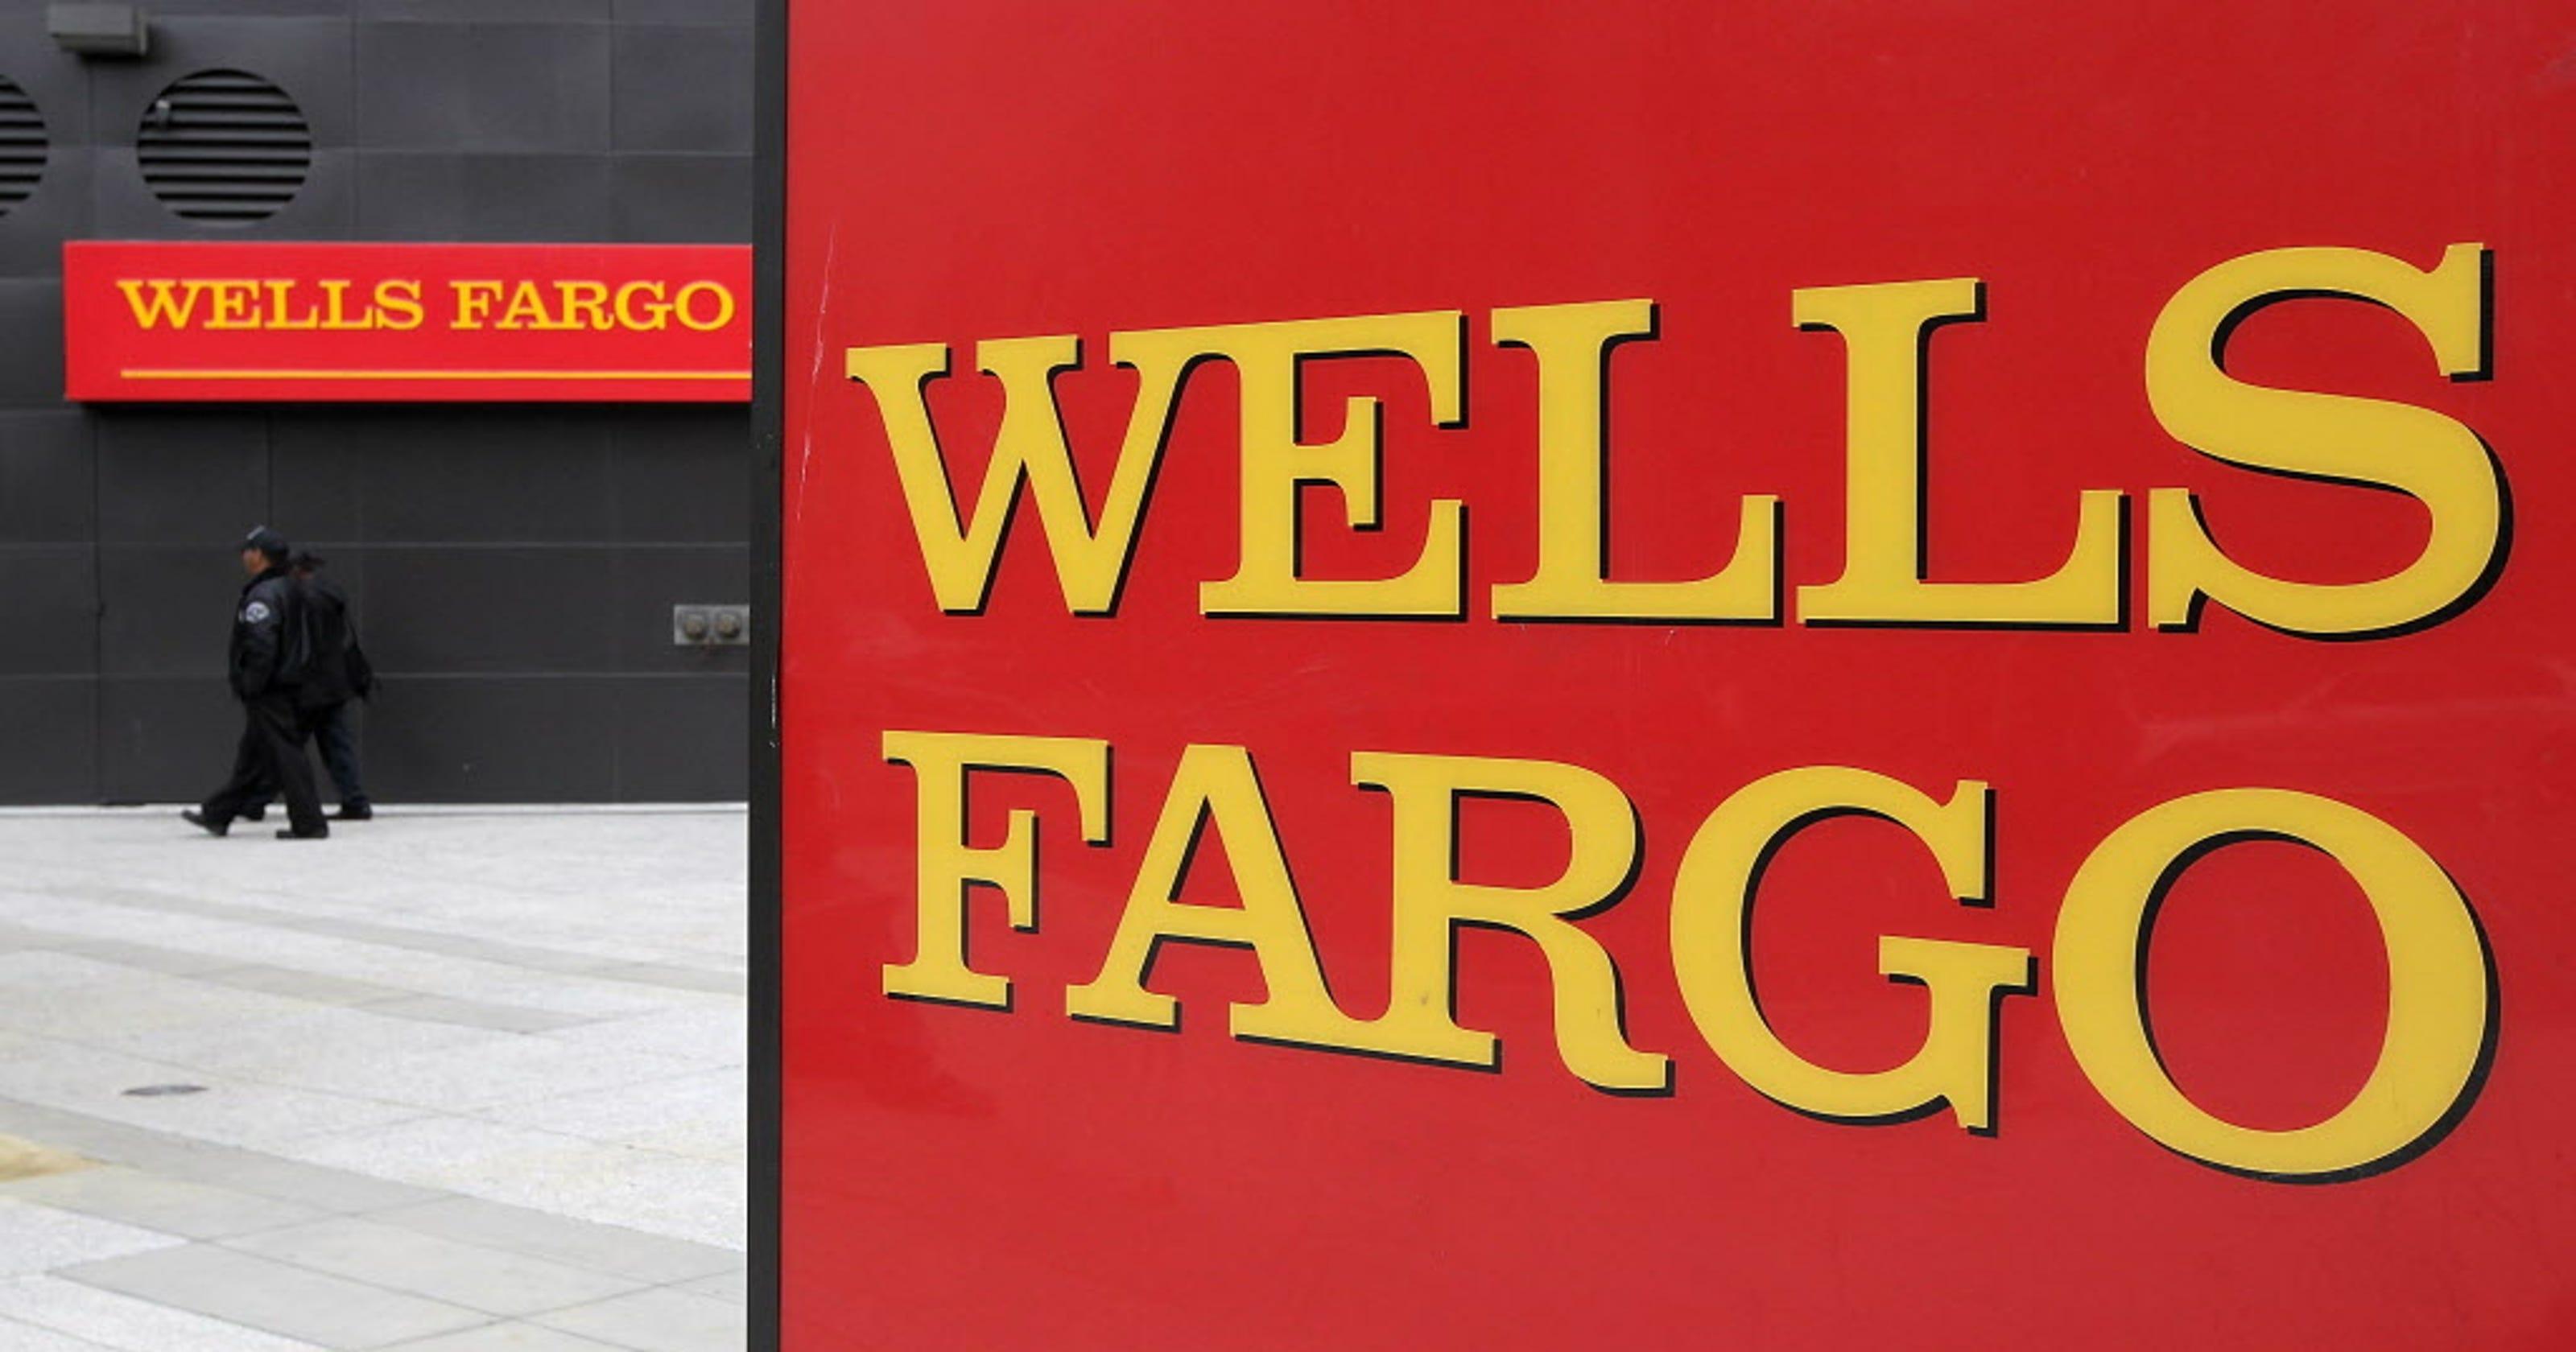 is wells fargo open after thanksgiving